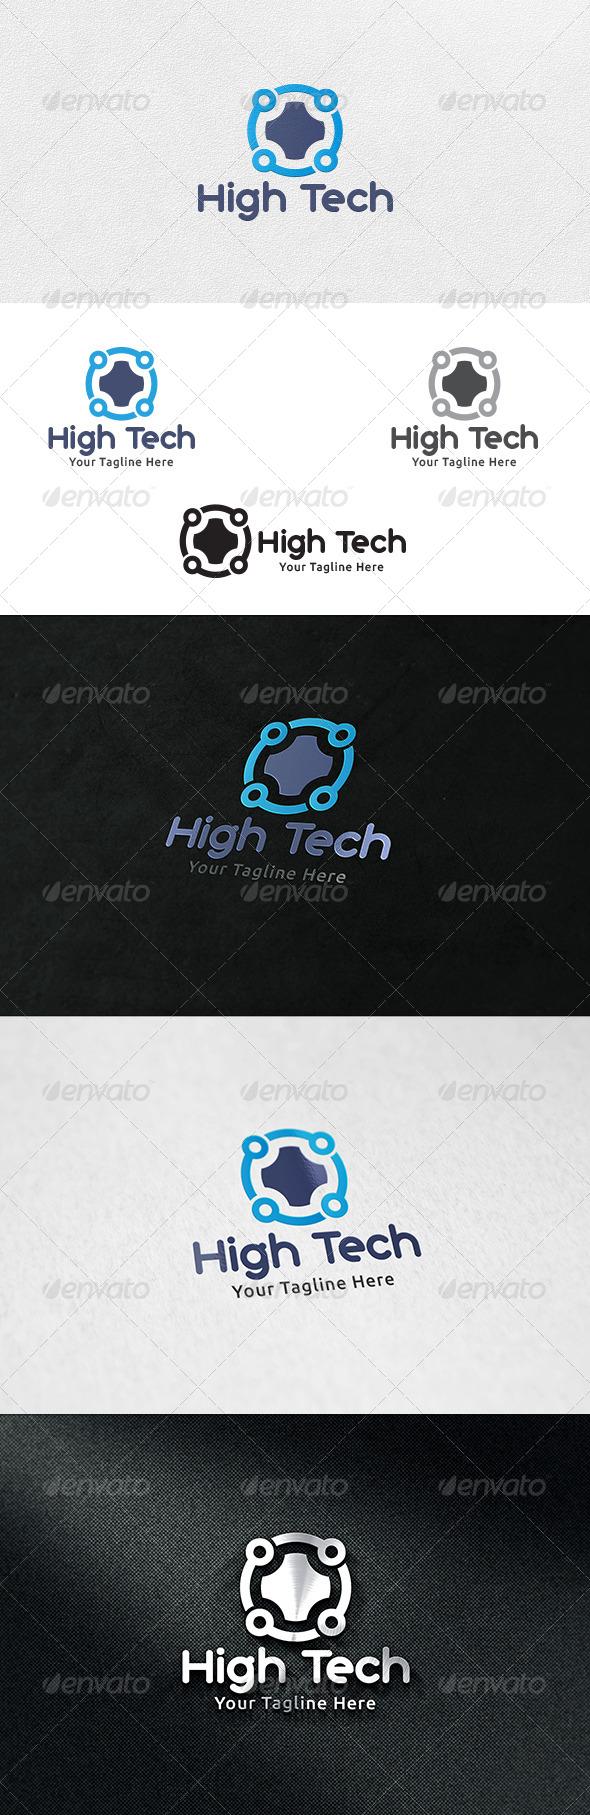 High Tech - Logo Template - Symbols Logo Templates